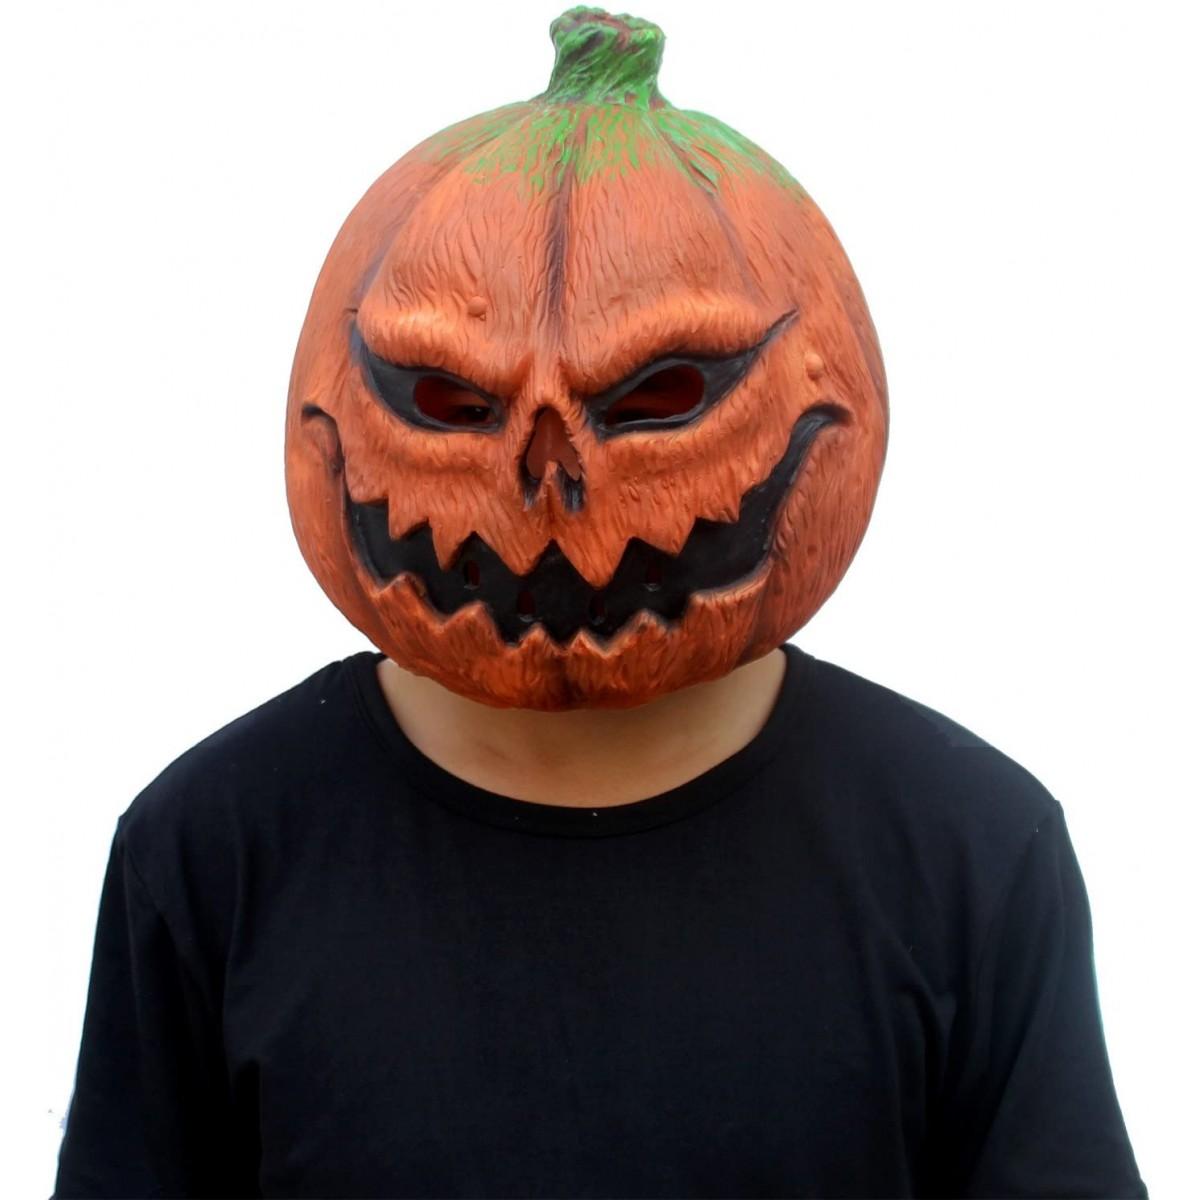 Zucca Halloween Per Bambini.Maschera In Lattice Zucca Di Halloween Per Bambini